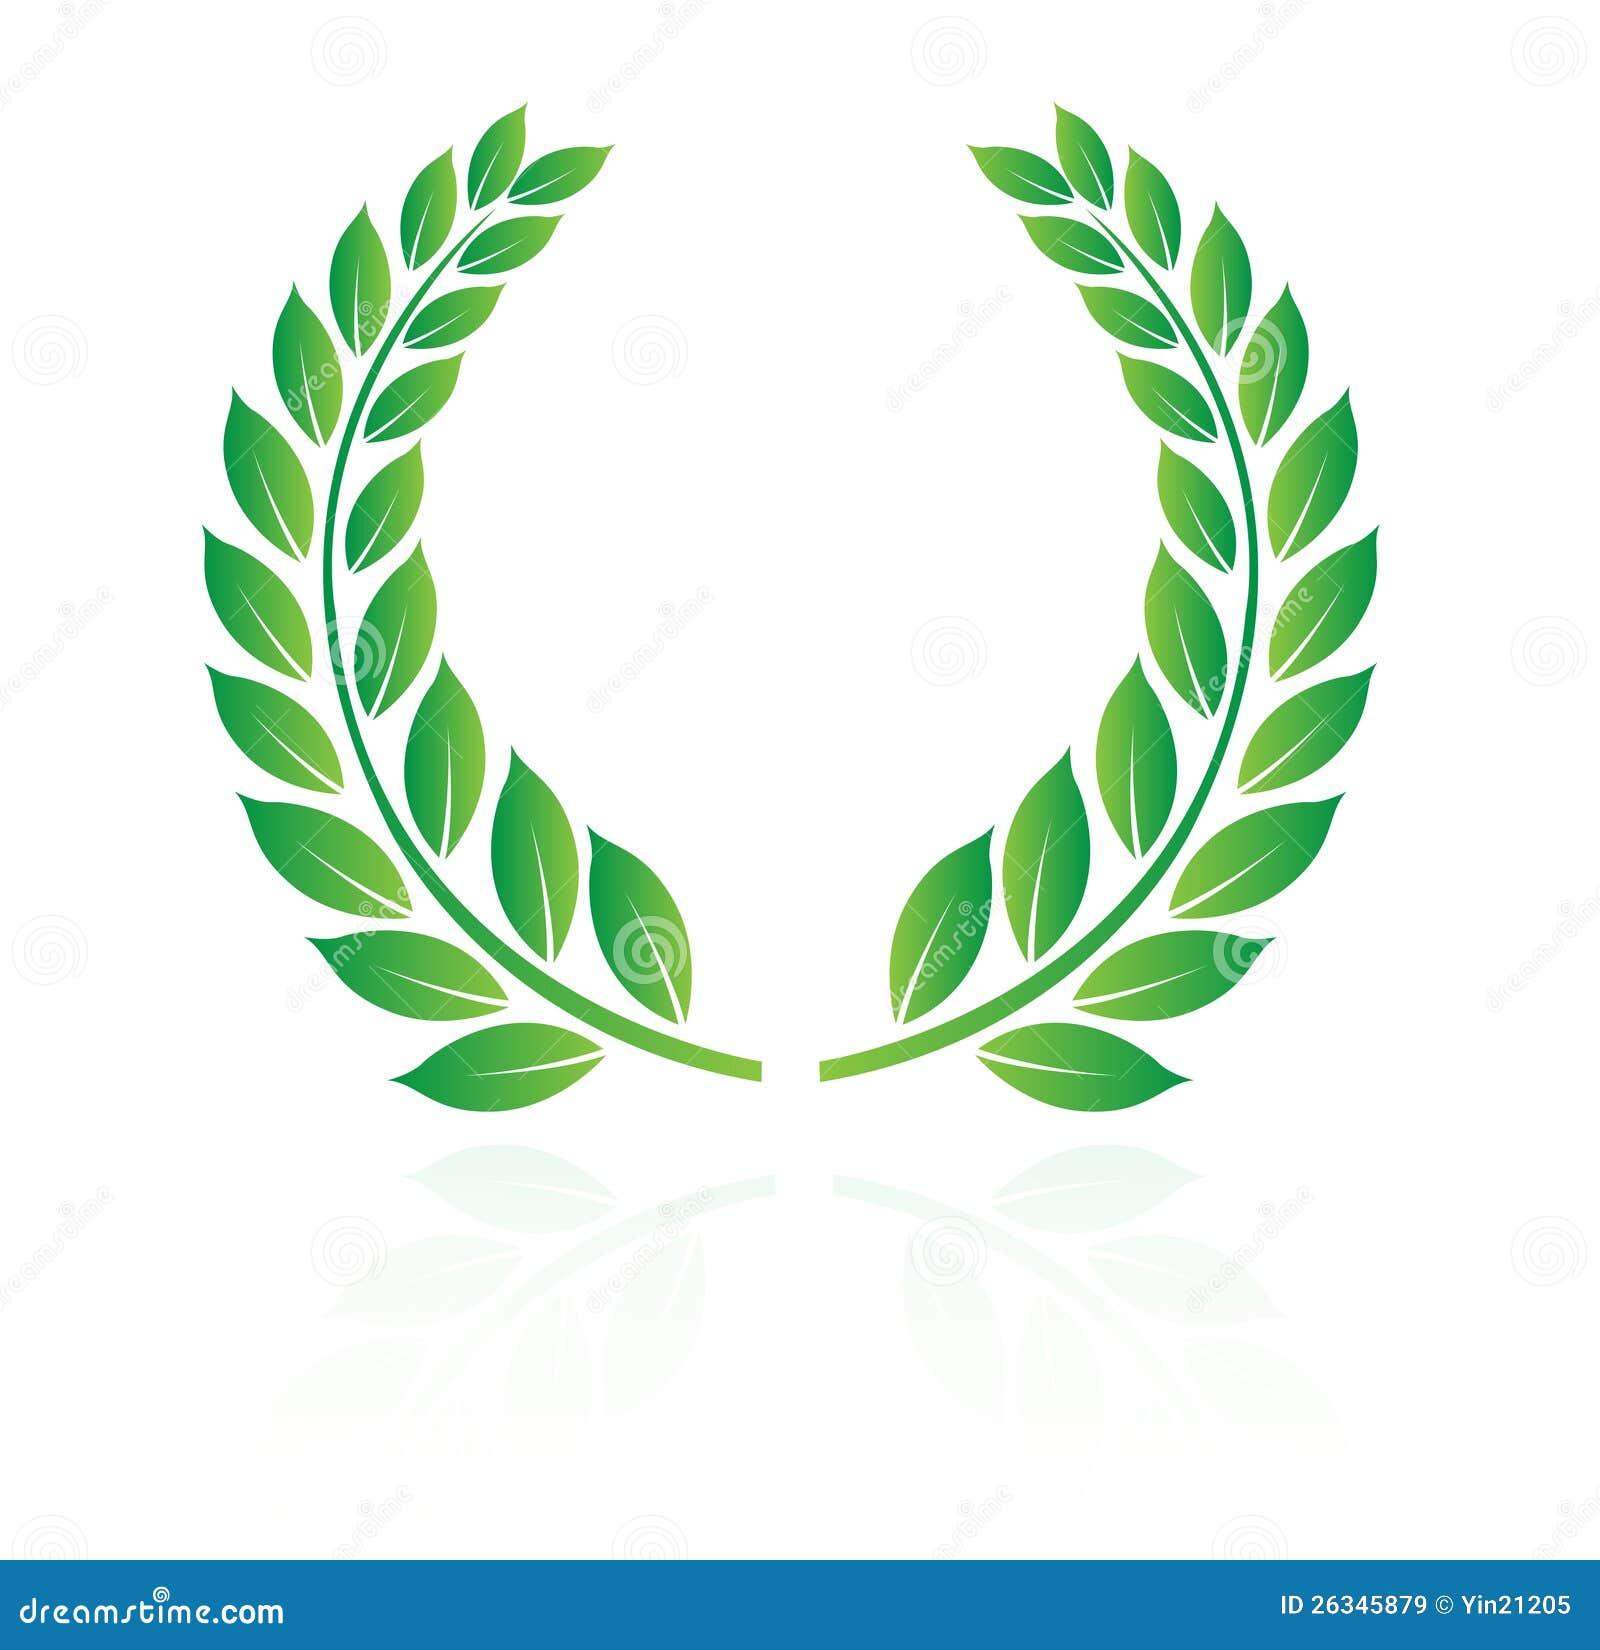 Mainline Art And Design : Laurel wreath stock vector illustration of white